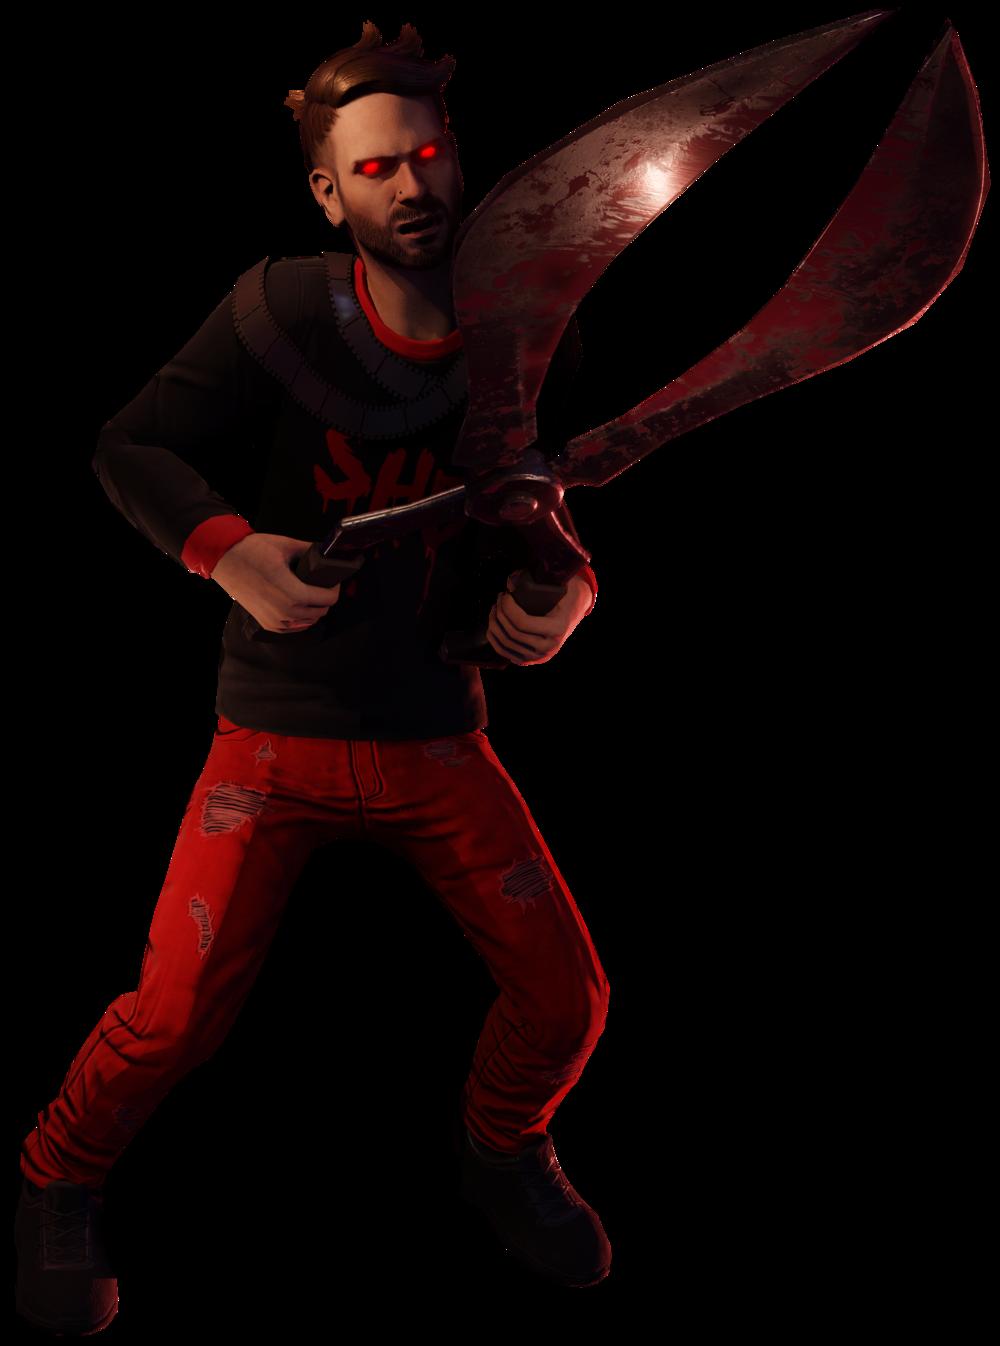 Dark Deception: Monsters & Mortals - Character Types + Status and Skills - New Players Guide - UK Mortal Creators Pack DLC stats - 24D61D3